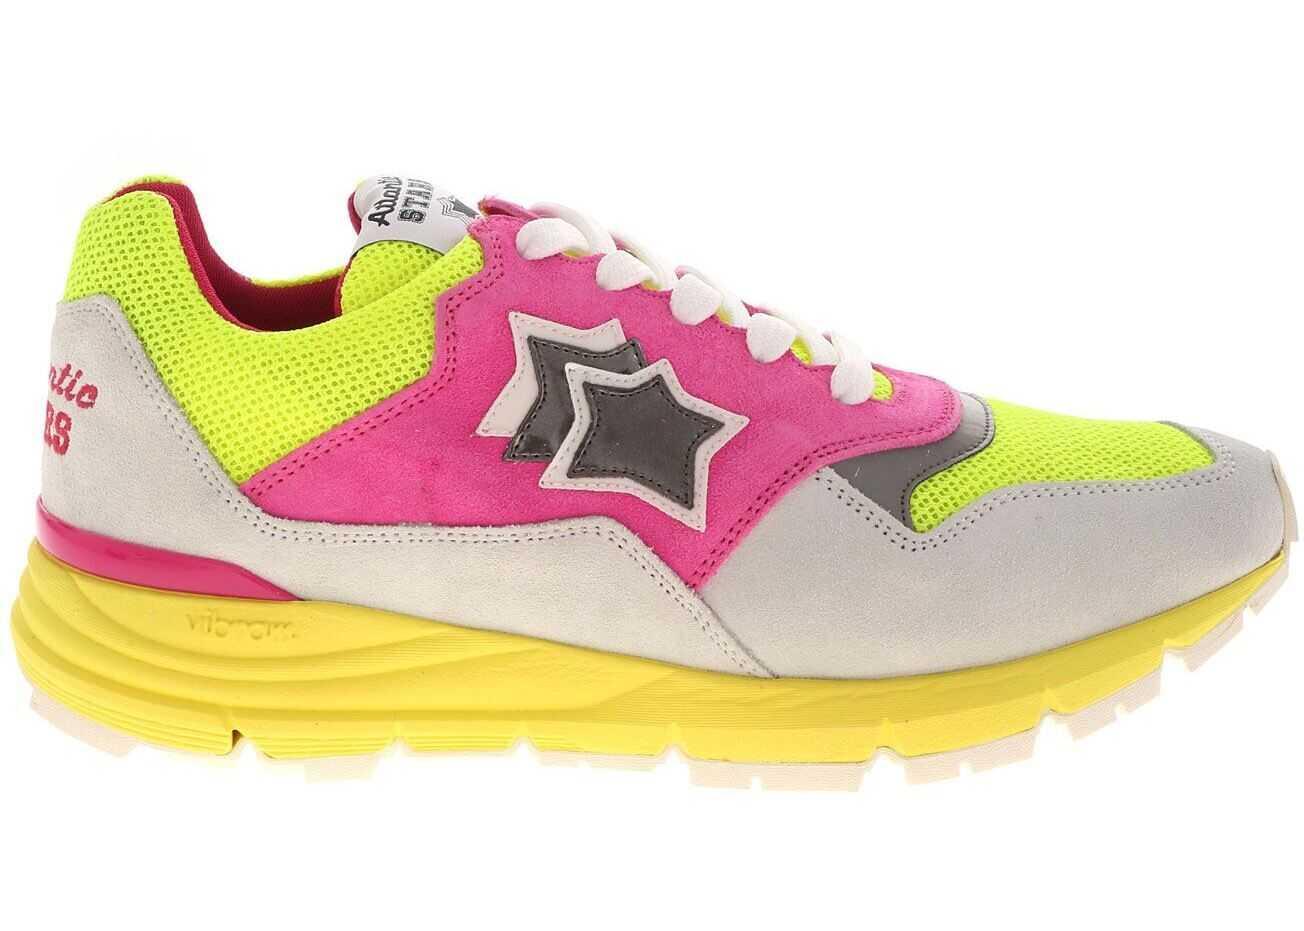 Atlantic Stars Agena Sneakers In Ecru And Fluo Fuchsia